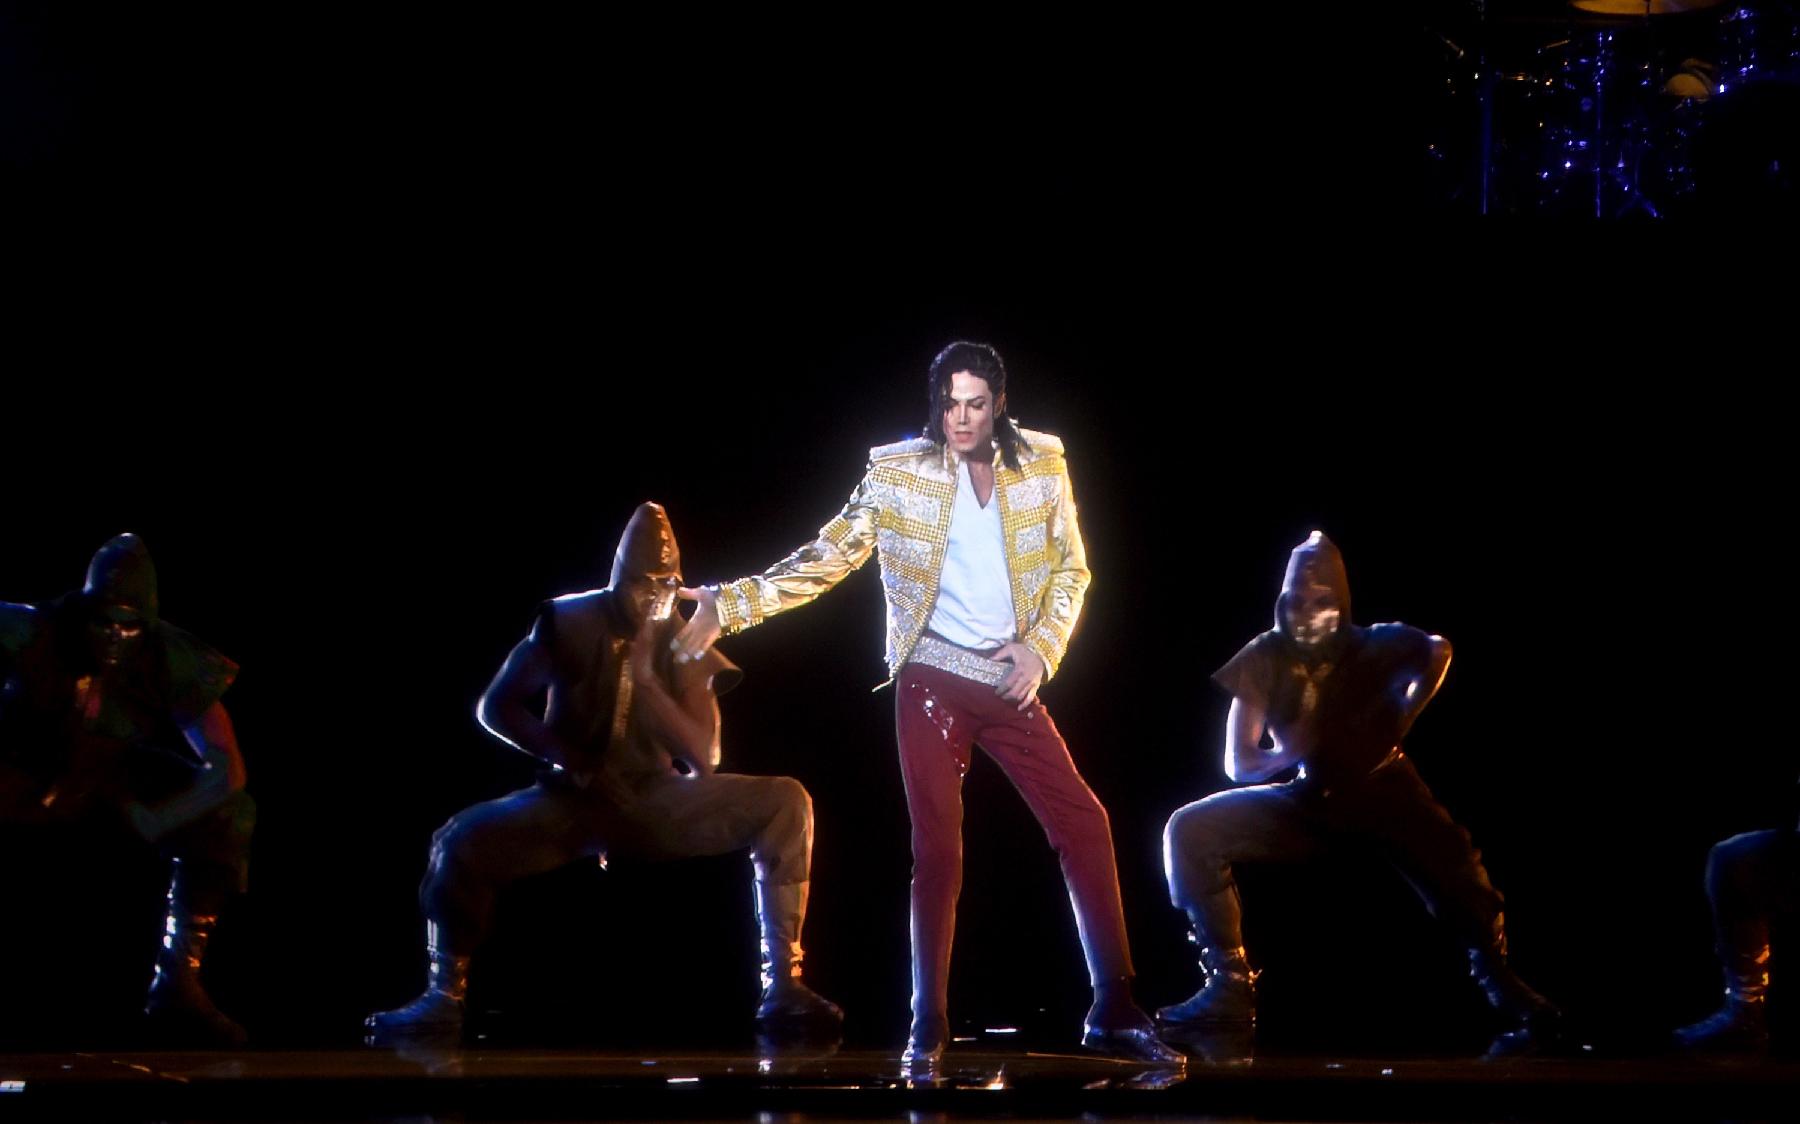 Michael Jackson 'Hologram' Creator Files $10 Million Countersuit